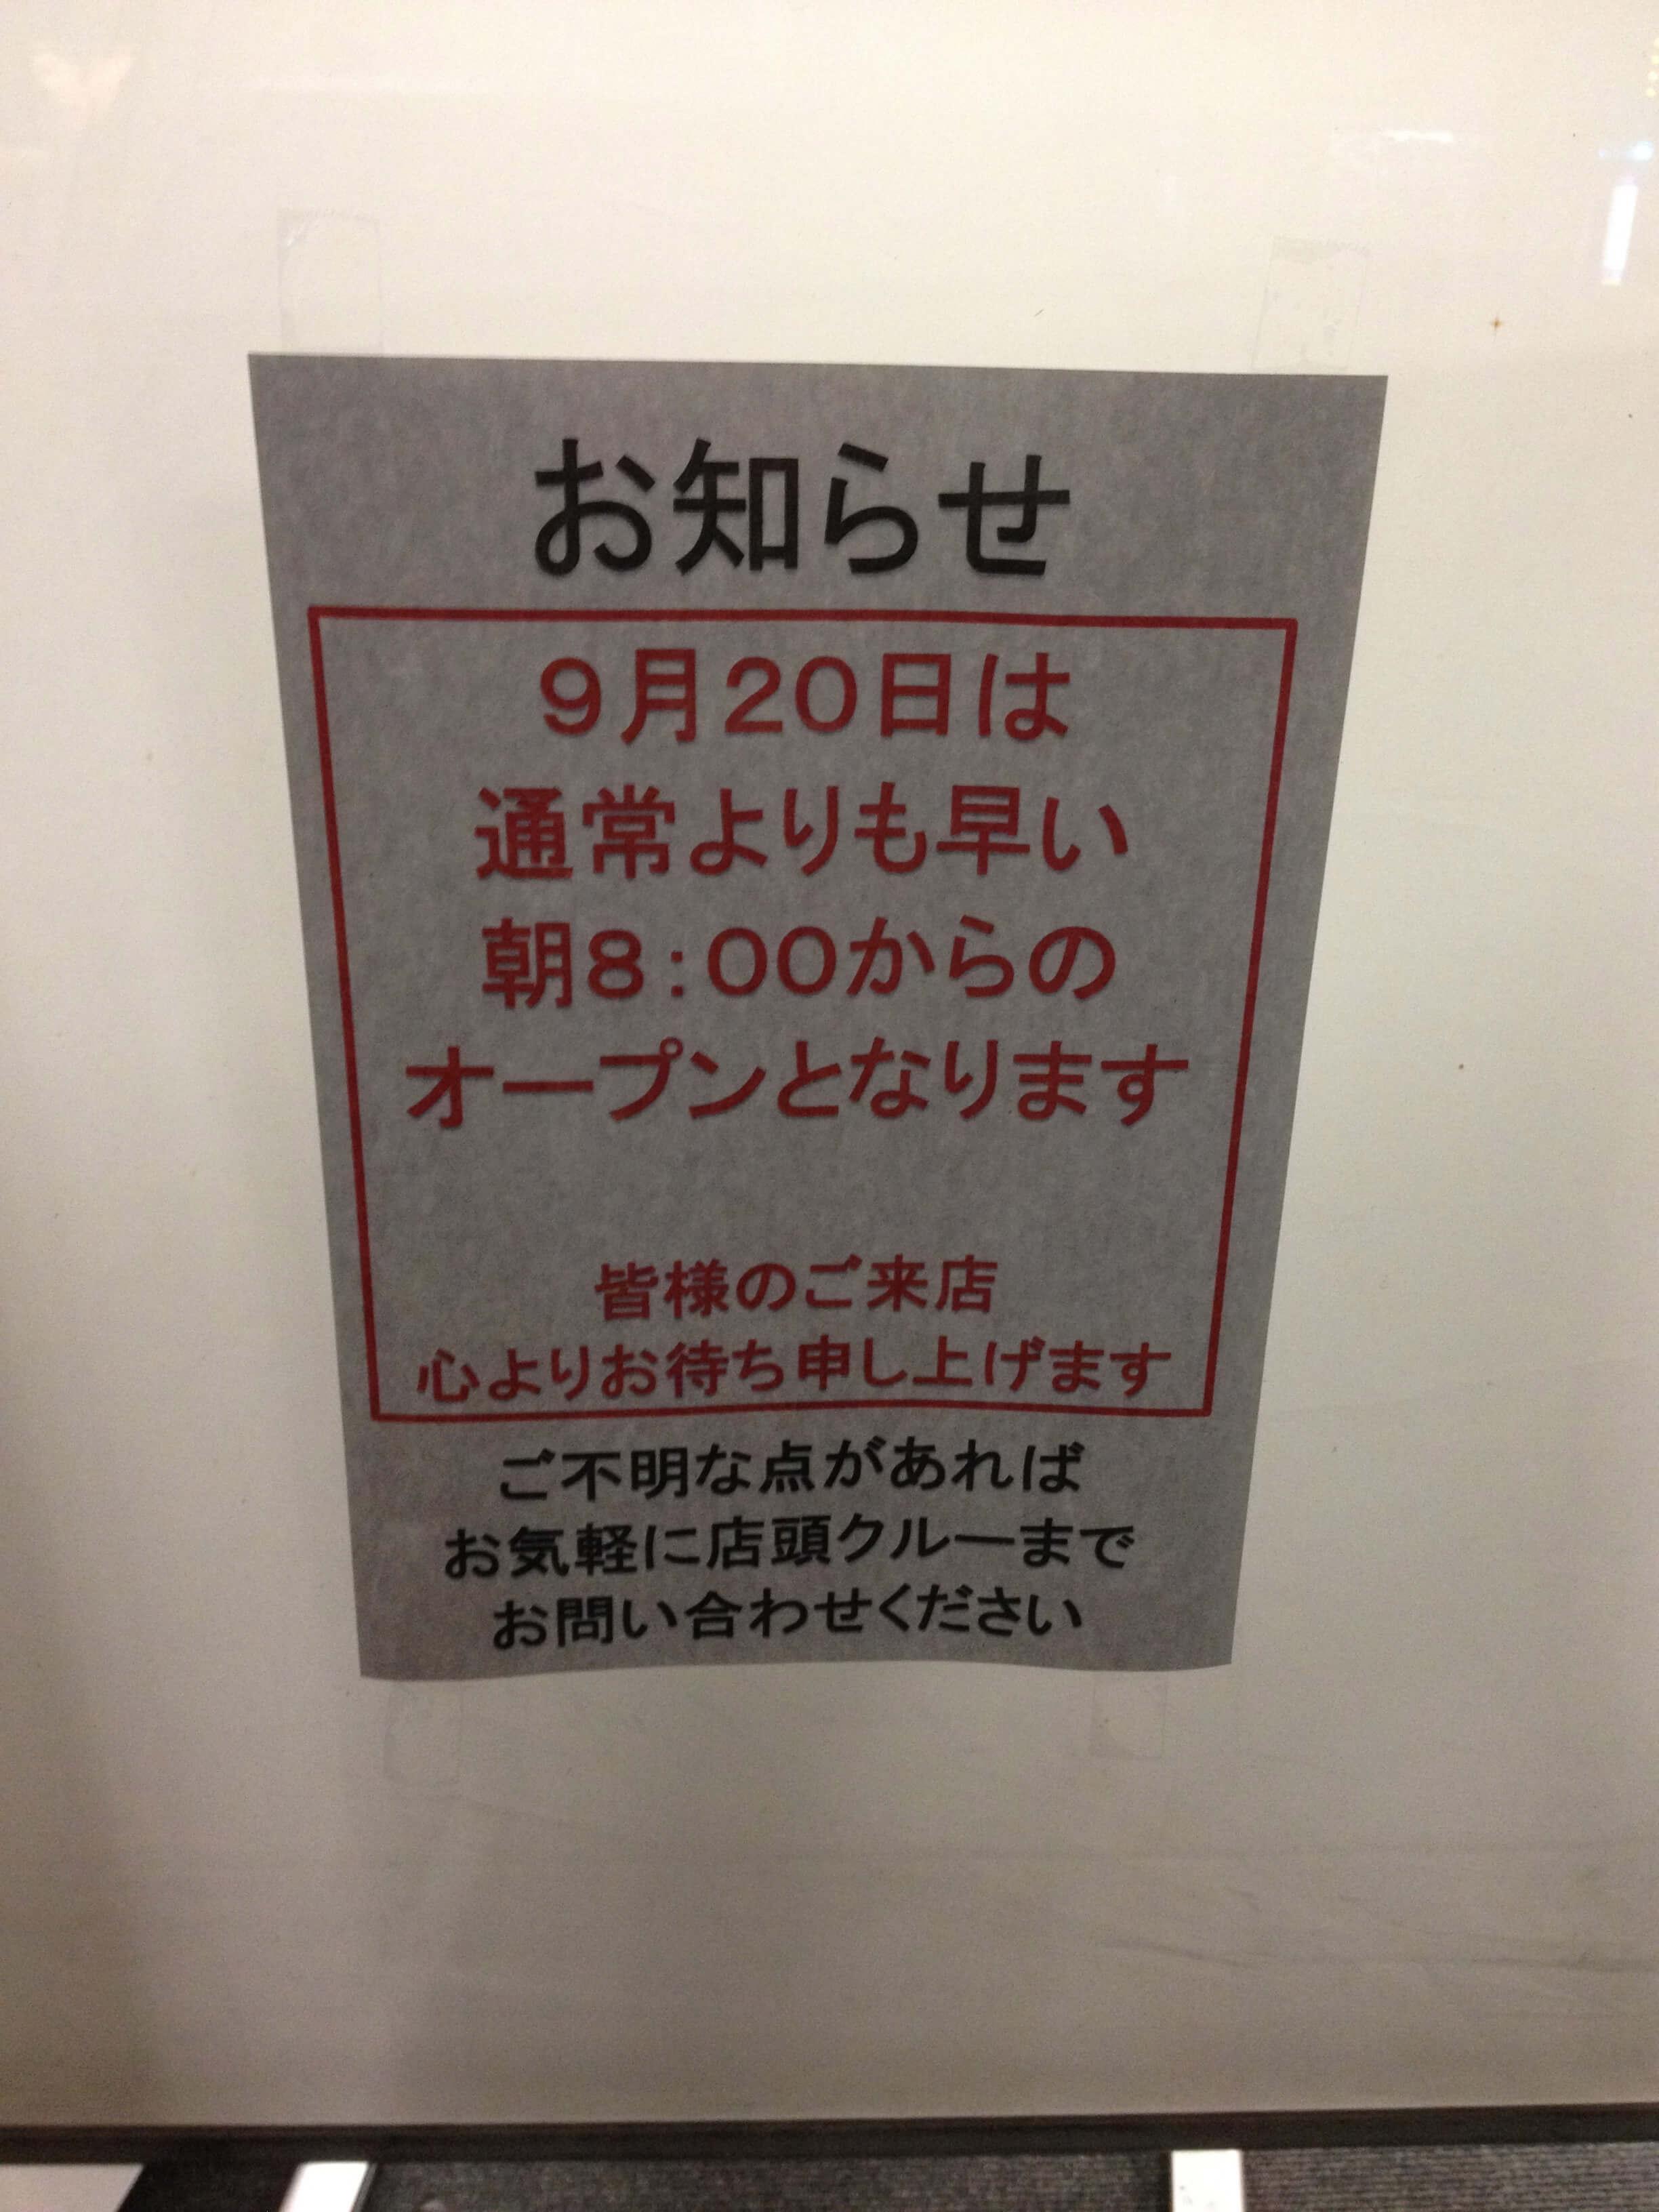 iPhone5s,c発売間近!